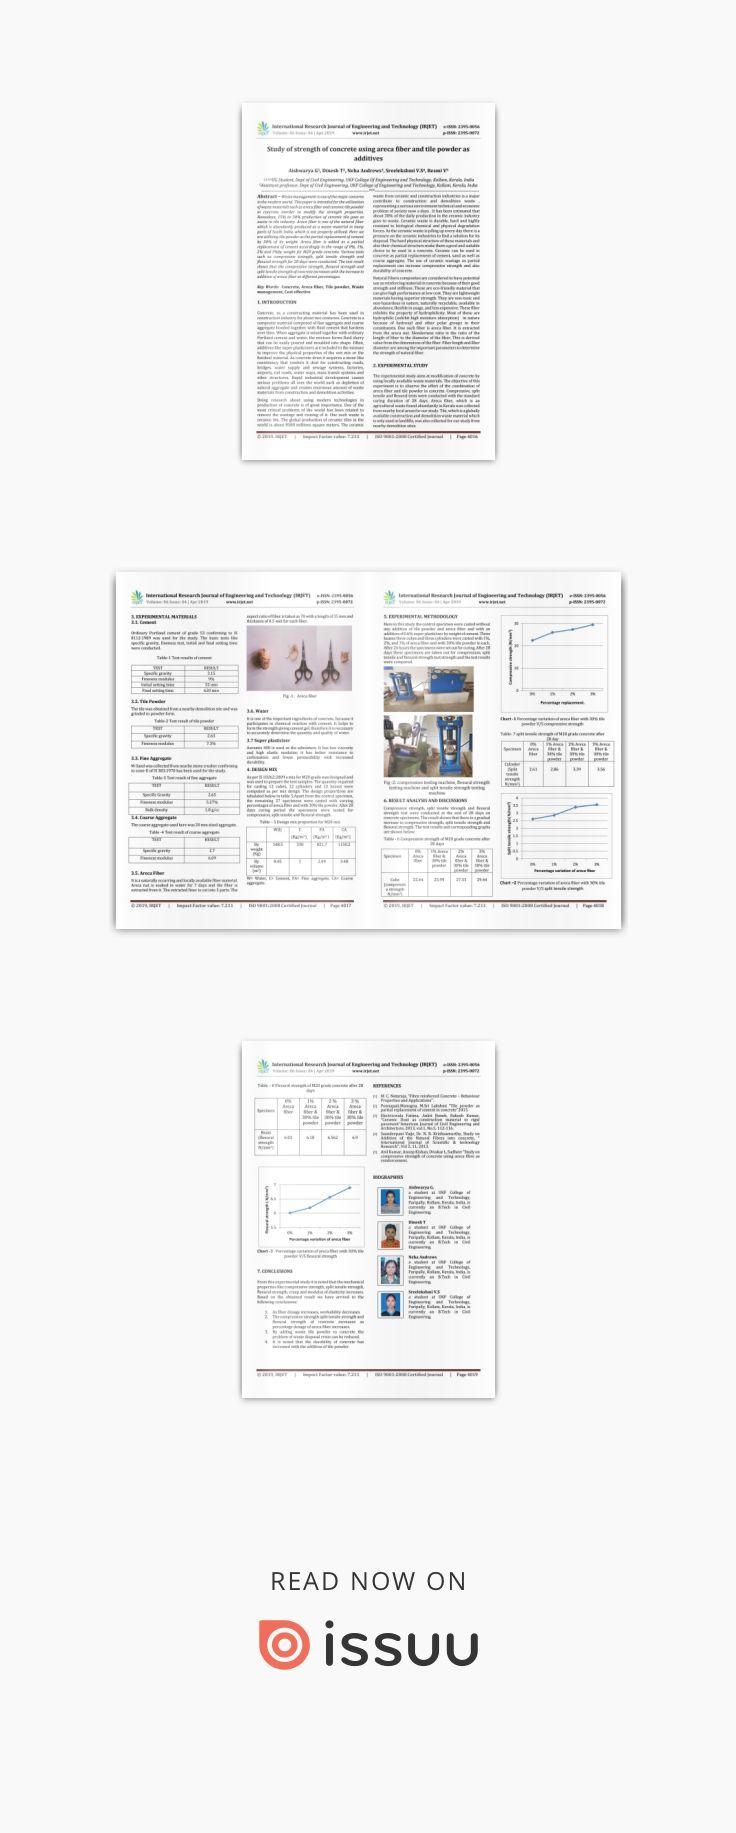 IRJET- Study of Strength of Concrete using Areca Fiber and